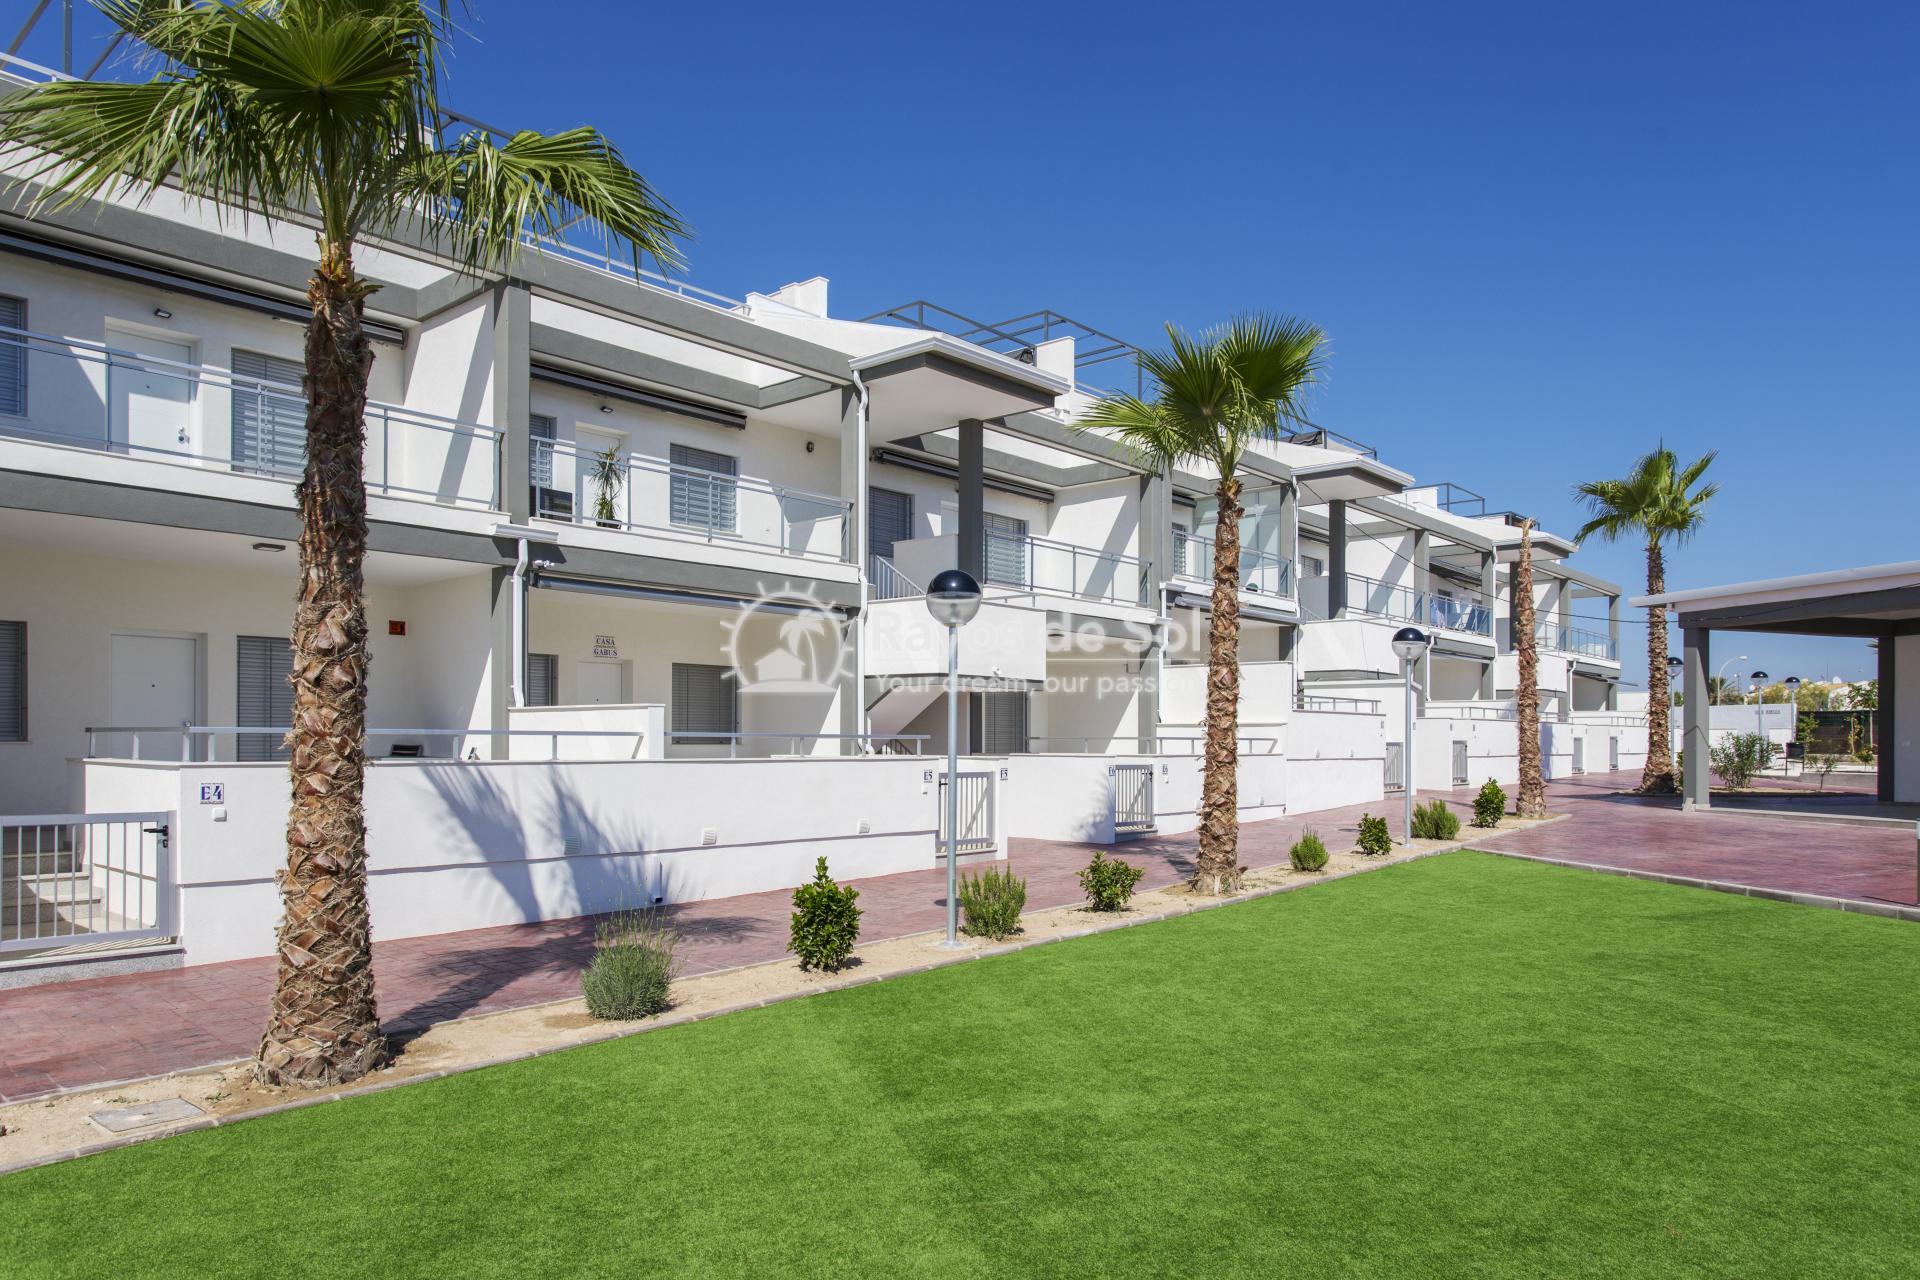 Appartement begane grond  in La Florida, Orihuela Costa, Costa Blanca (Oasis place BG3-2) - 1